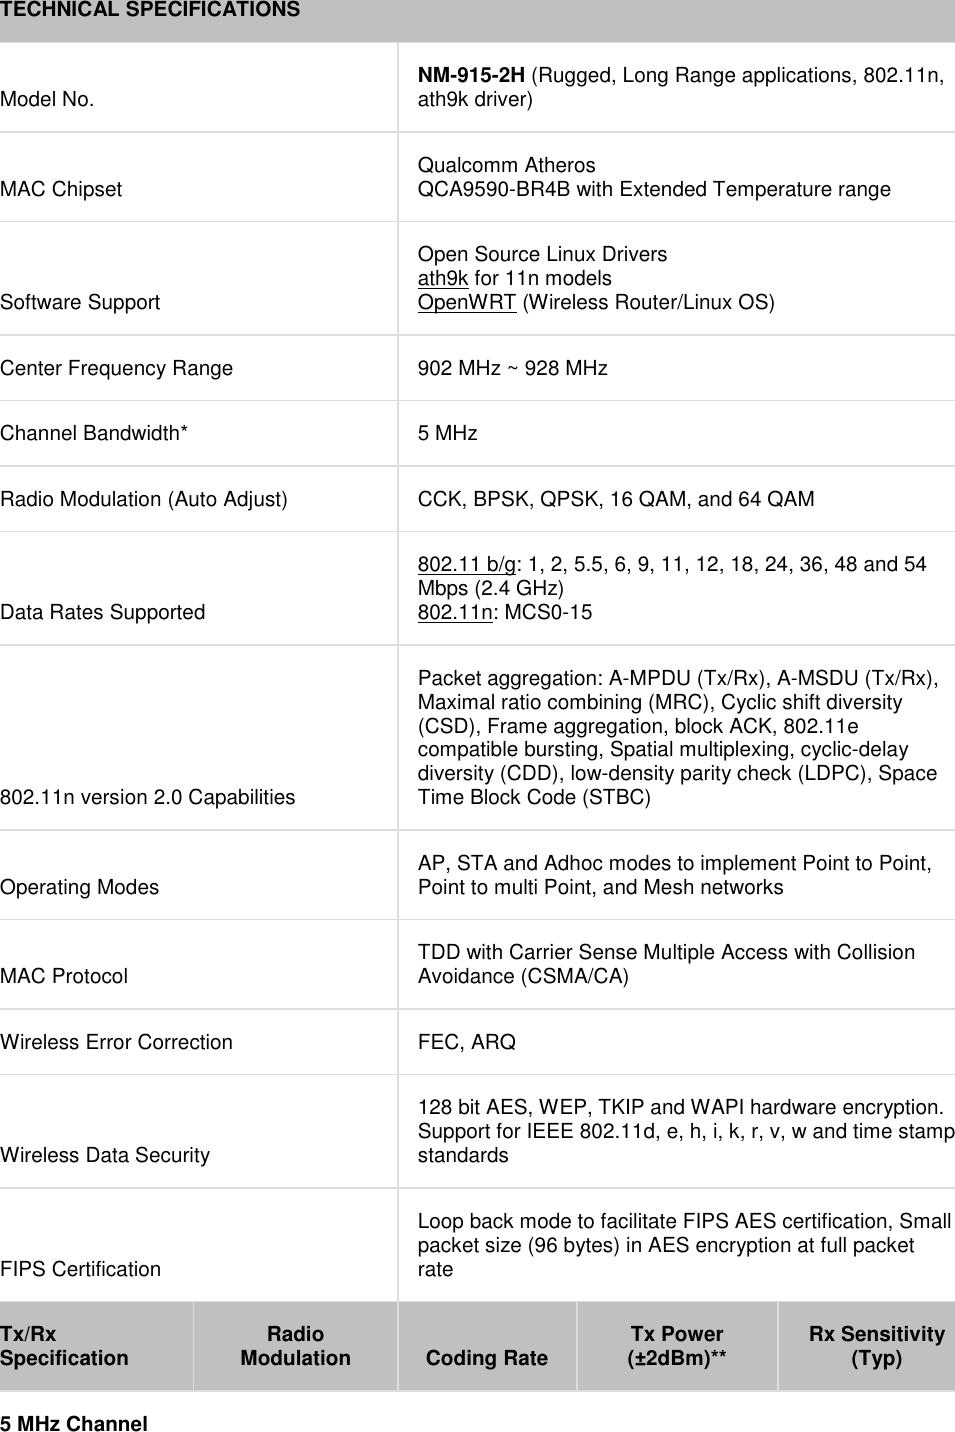 Doodle Labs NM-915-2H Prism Wi-Fi Radio Transceiver User Manual